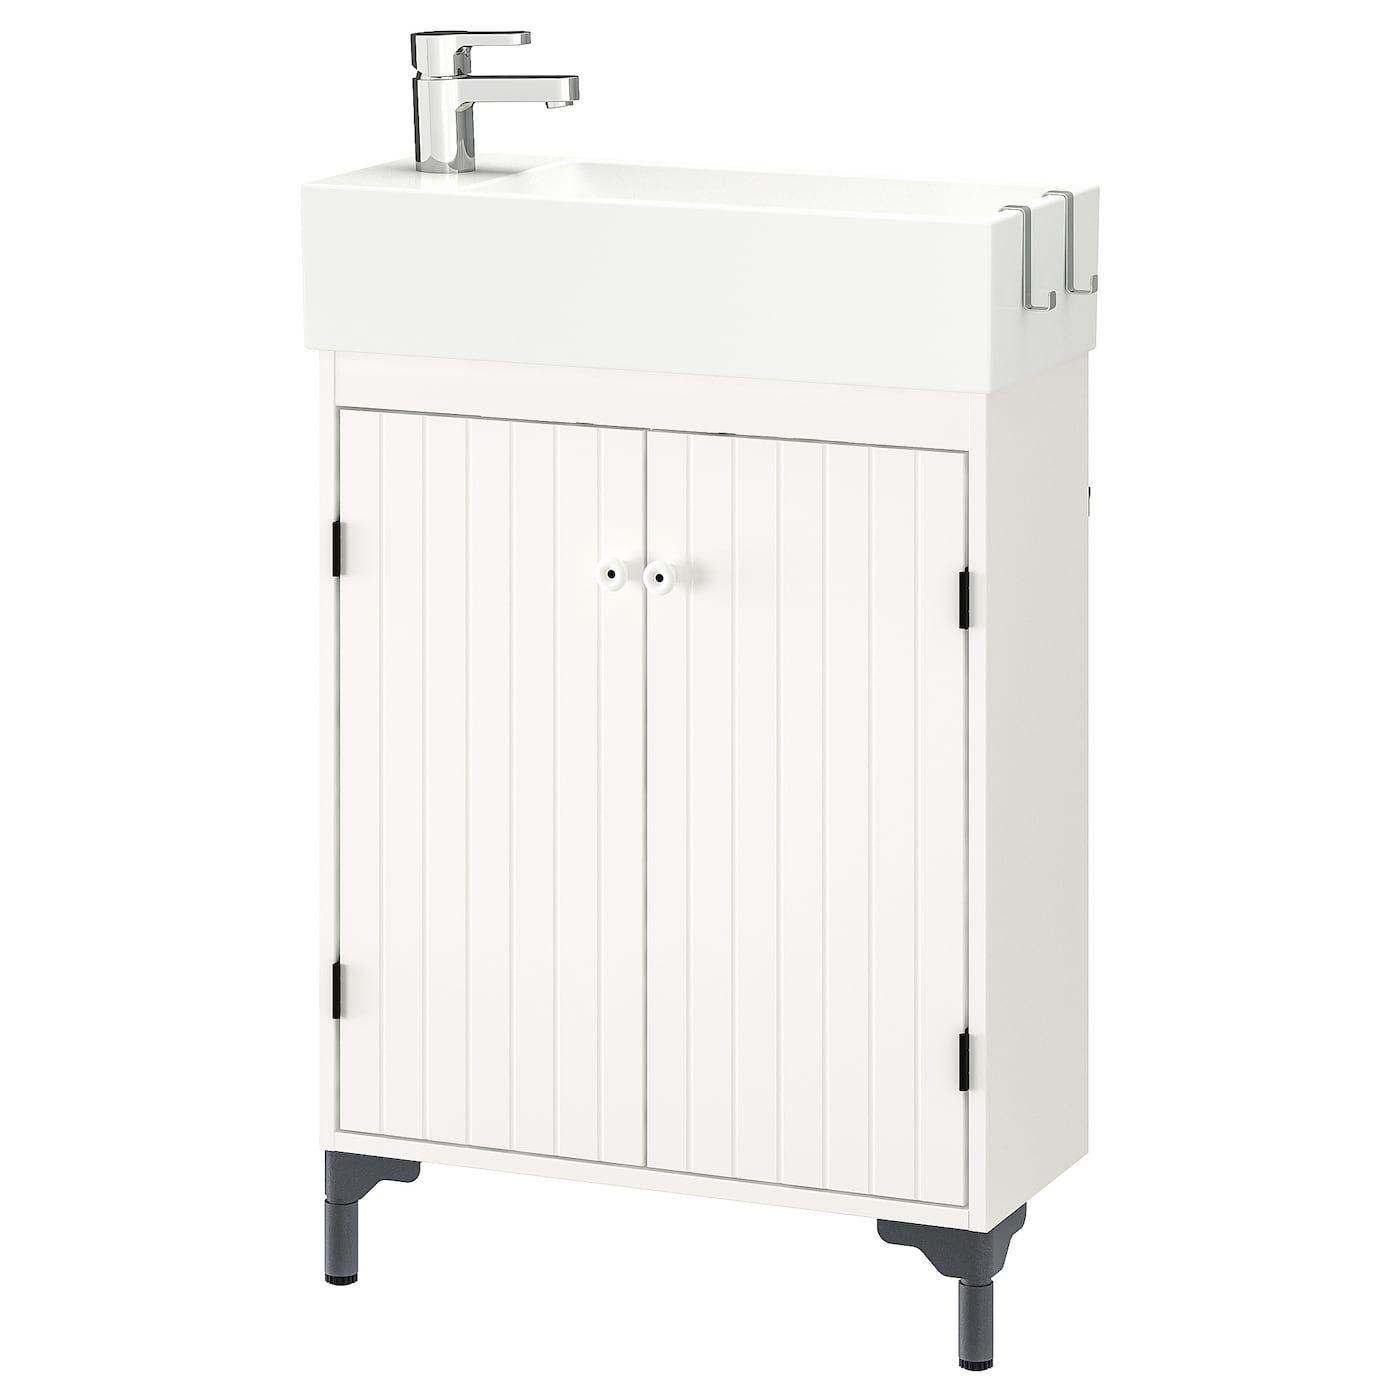 Ikea Us Furniture And Home Furnishings Sink Cabinet Ikea Silveran Small Bathroom